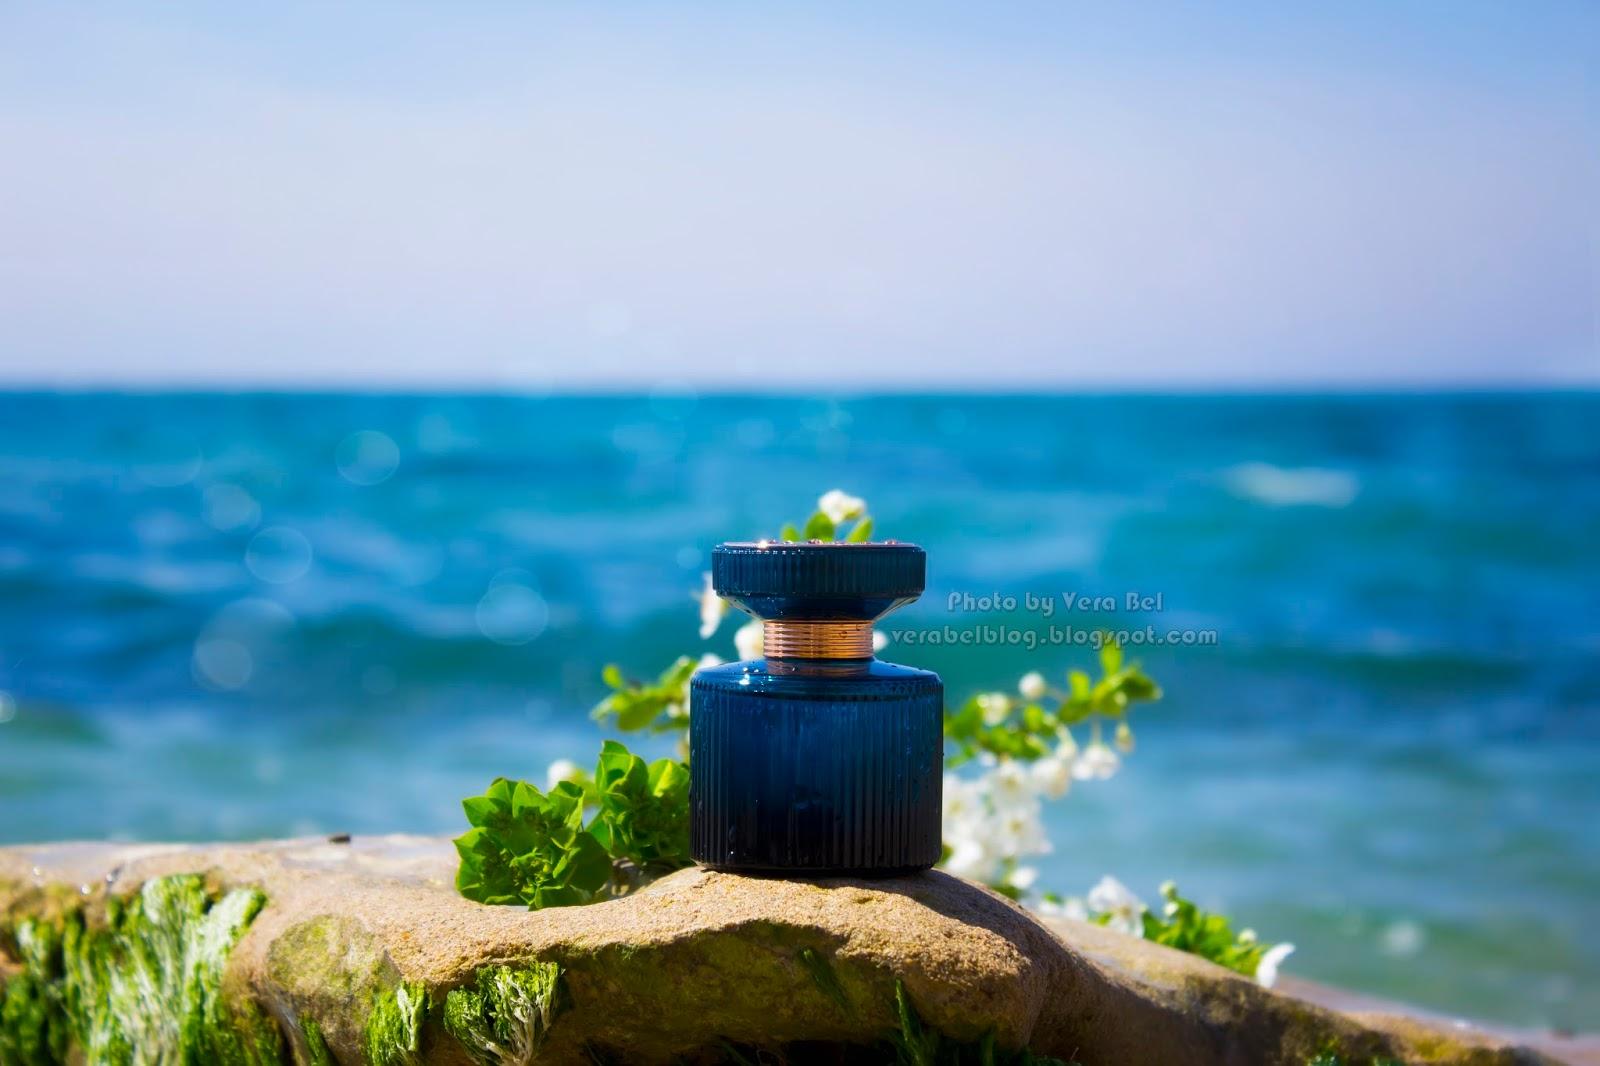 Vera Bel Oriflame парфюмерная вода Amber Elixir Crystal